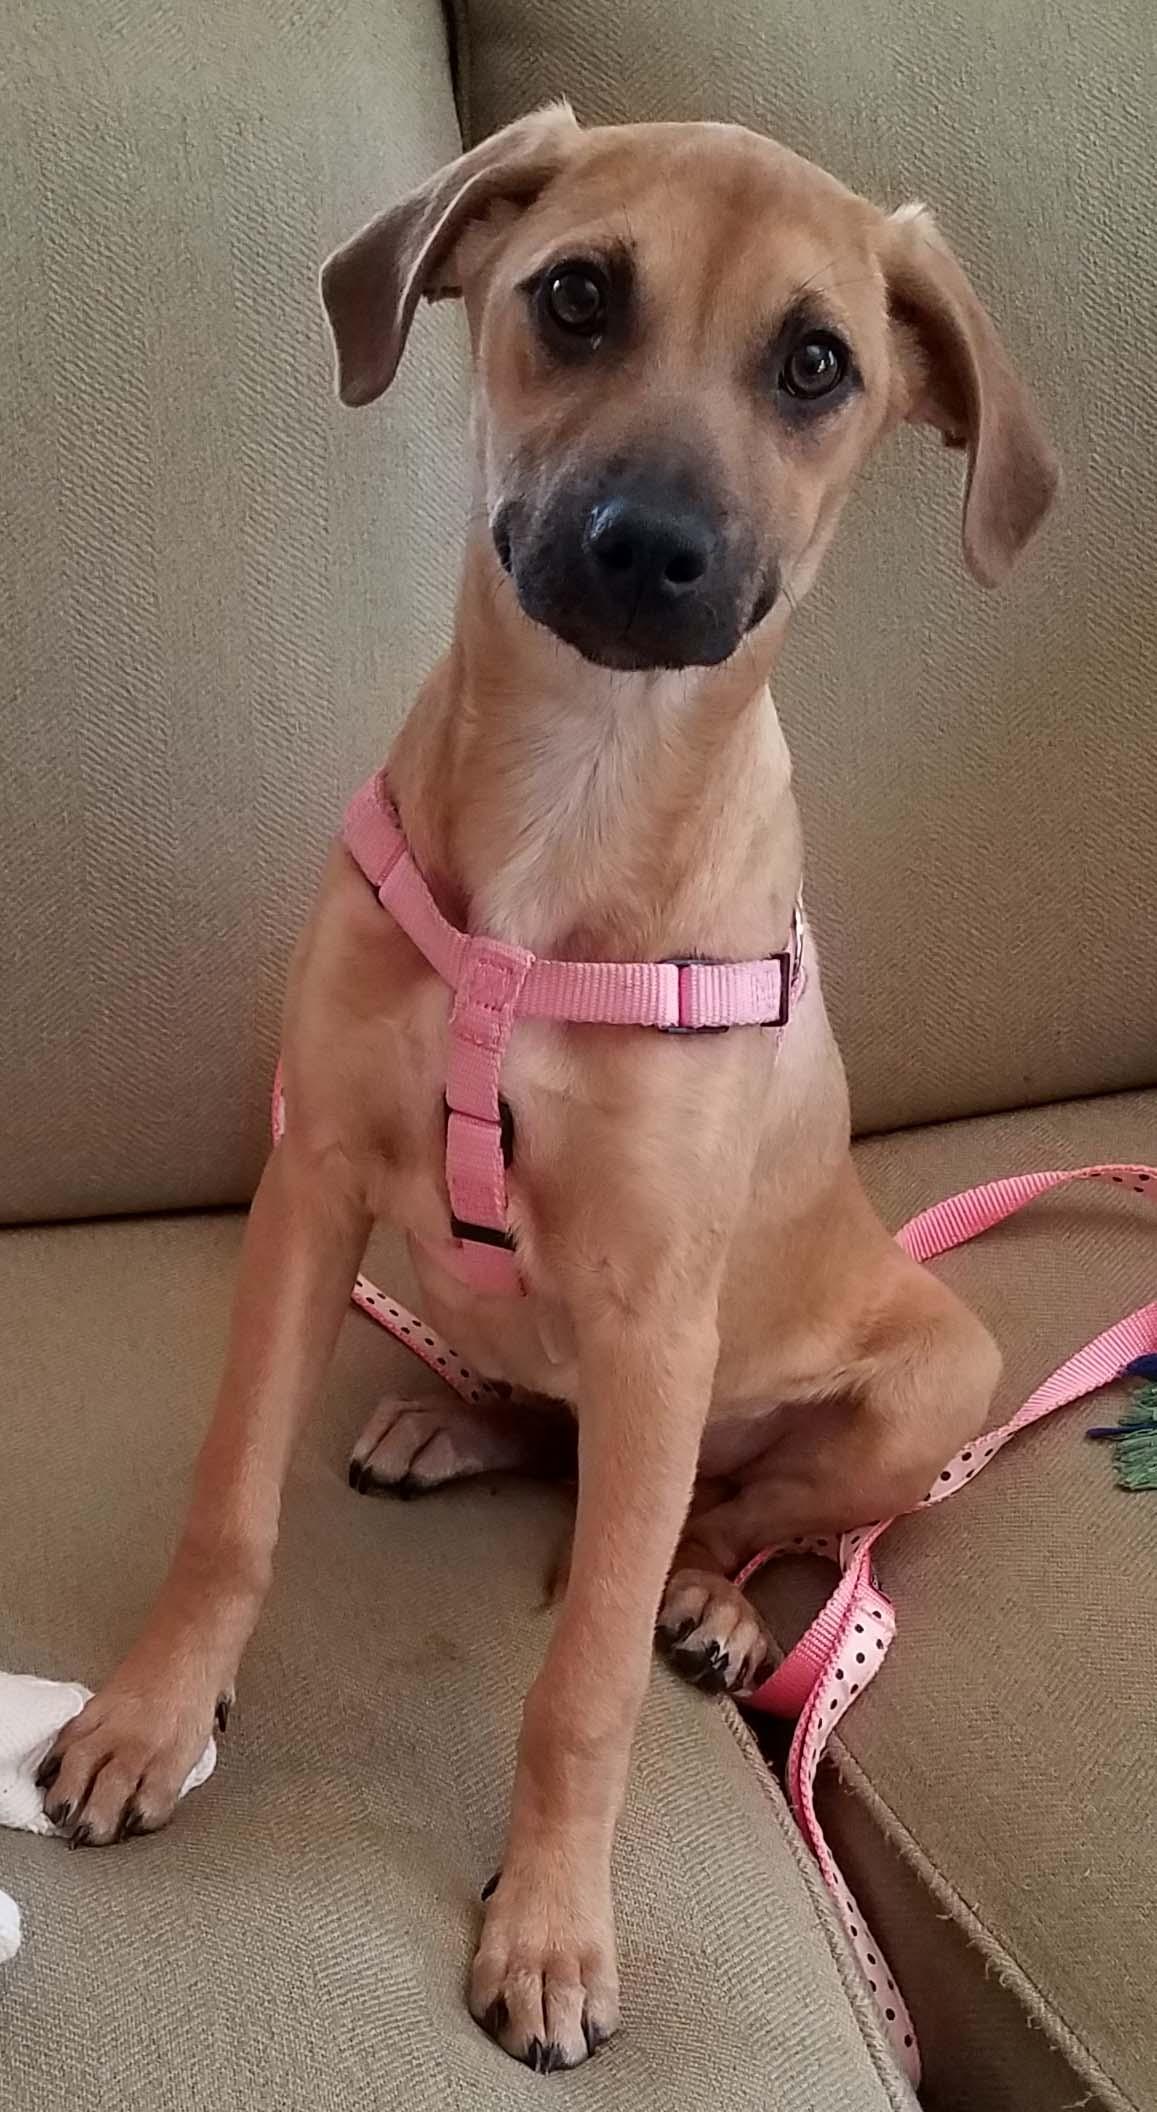 #sadie #blackmouthcur #timid #puppy